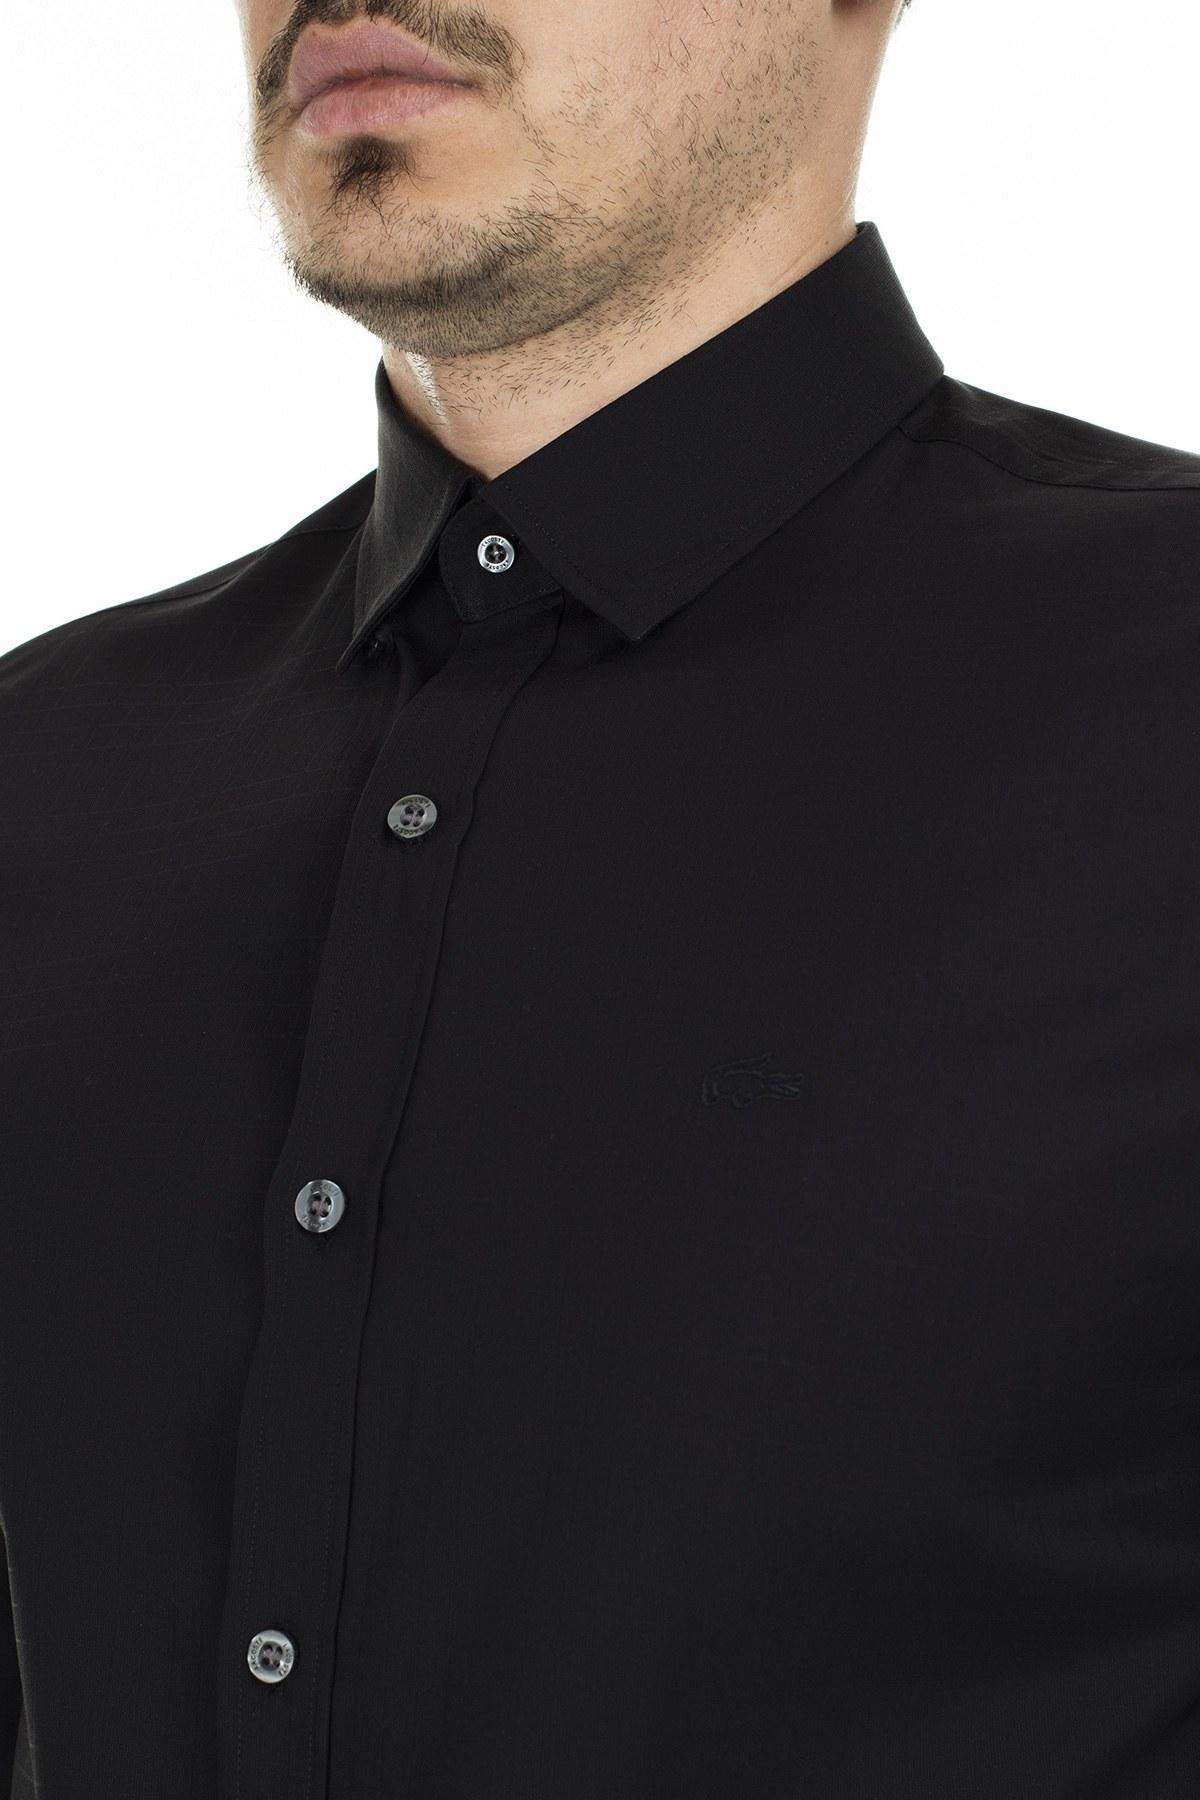 Lacoste Uzun Kollu % 100 Pamuk Slim Fit Erkek Gömlek CH2139 39S SİYAH